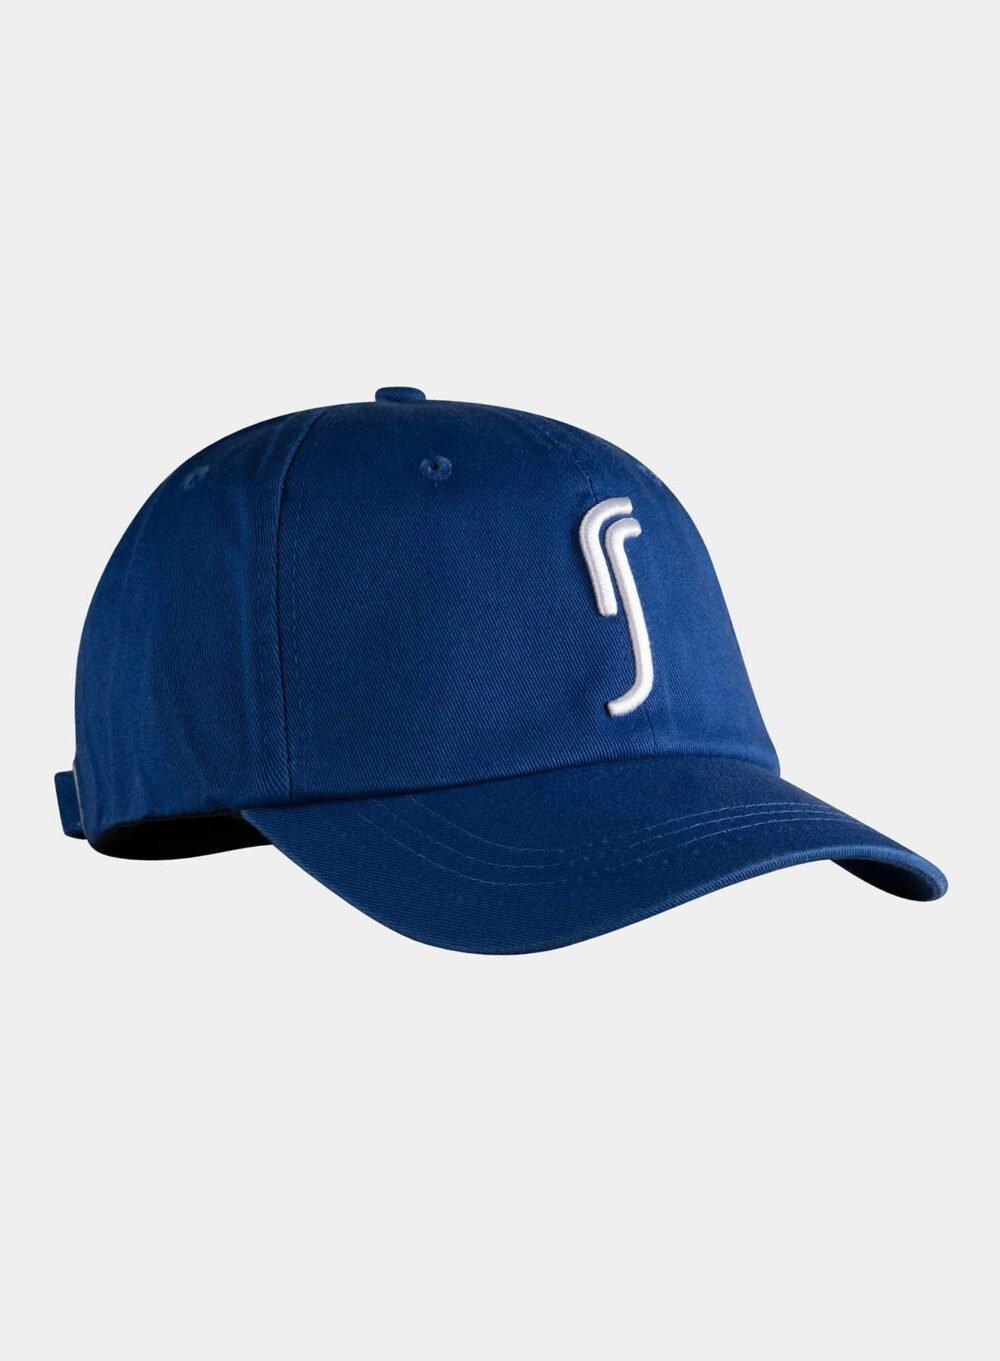 sports_dad_hat_blue_1